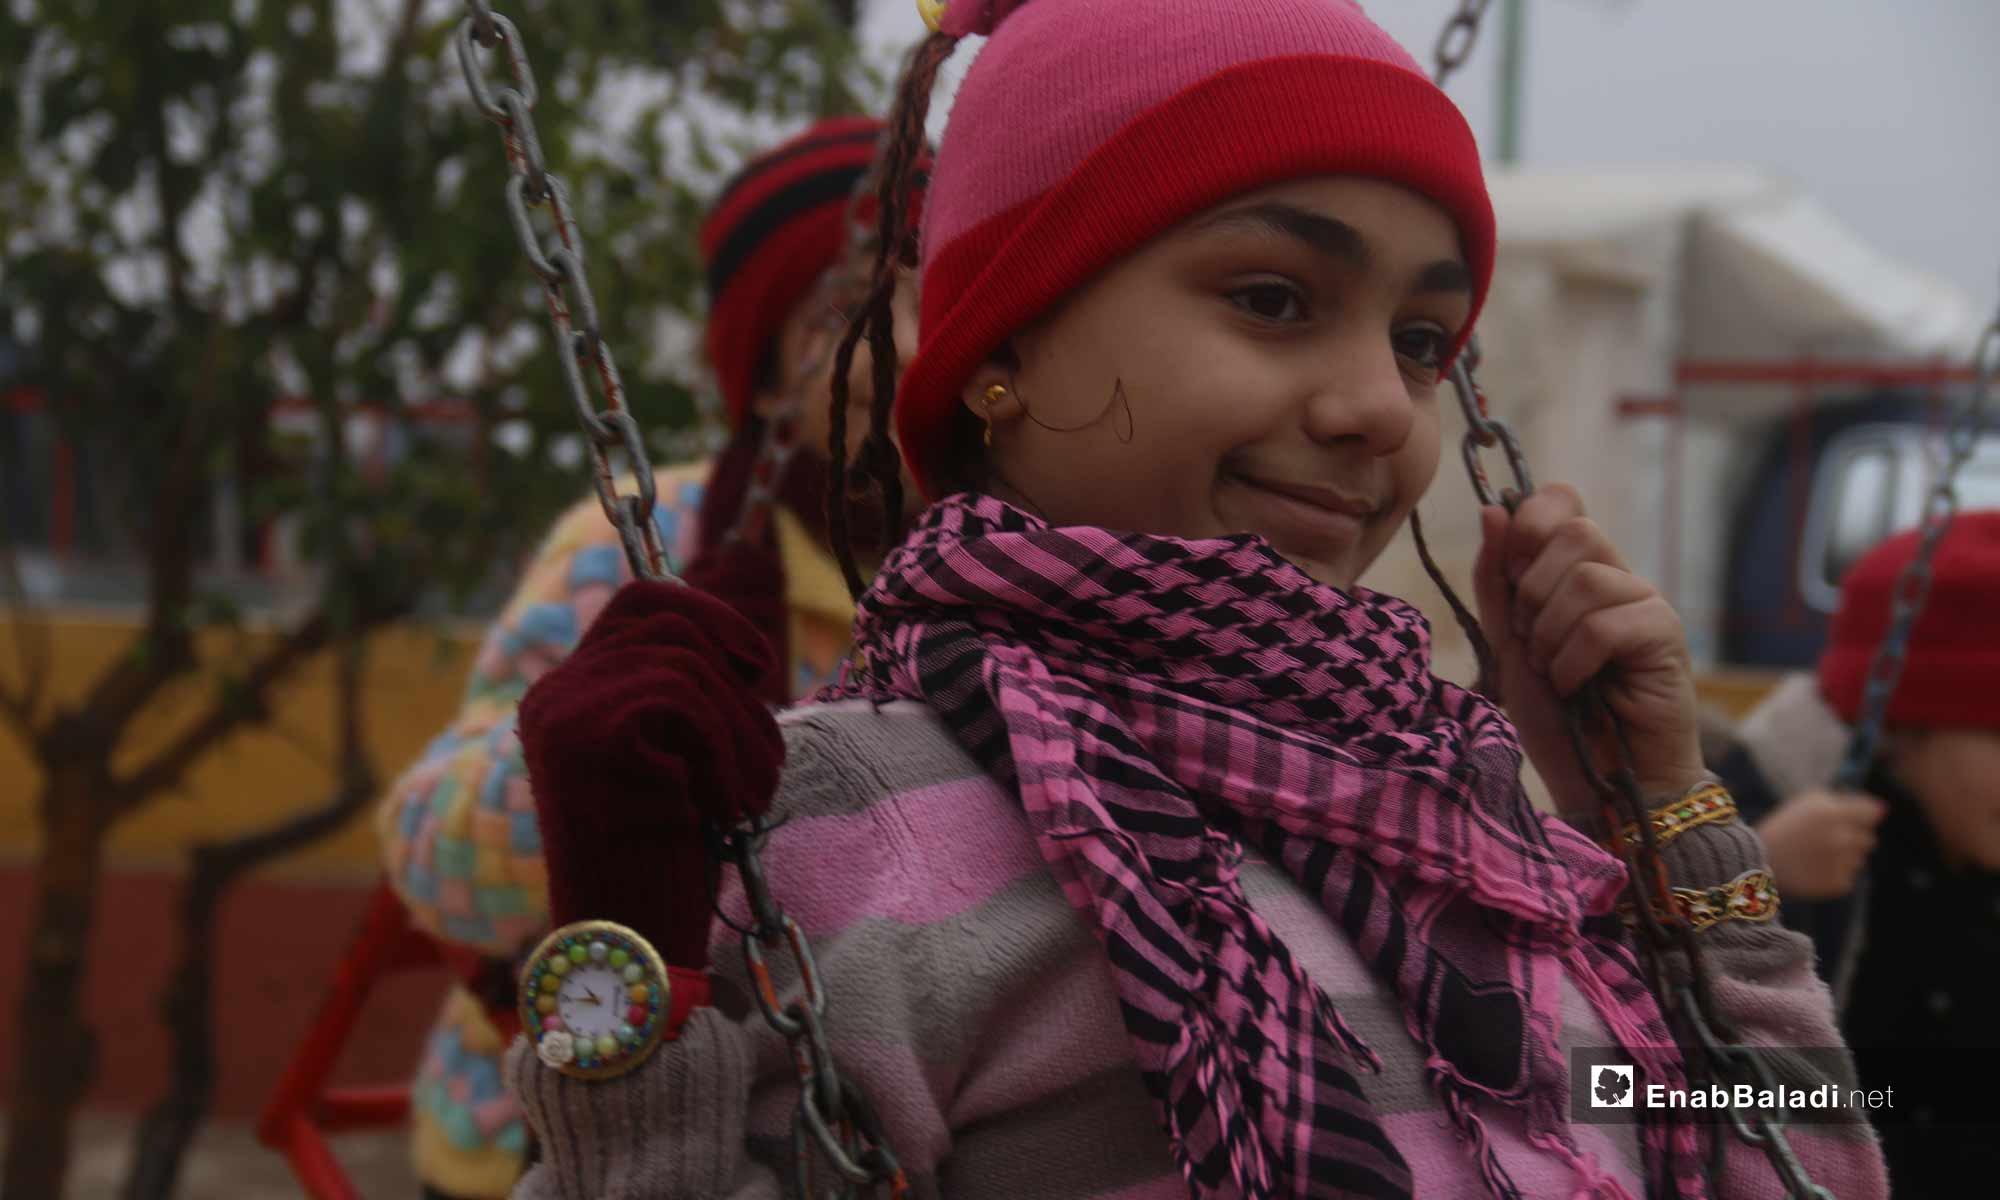 Children play at the al-Dalah Park in the city of Maarrat al-Nu